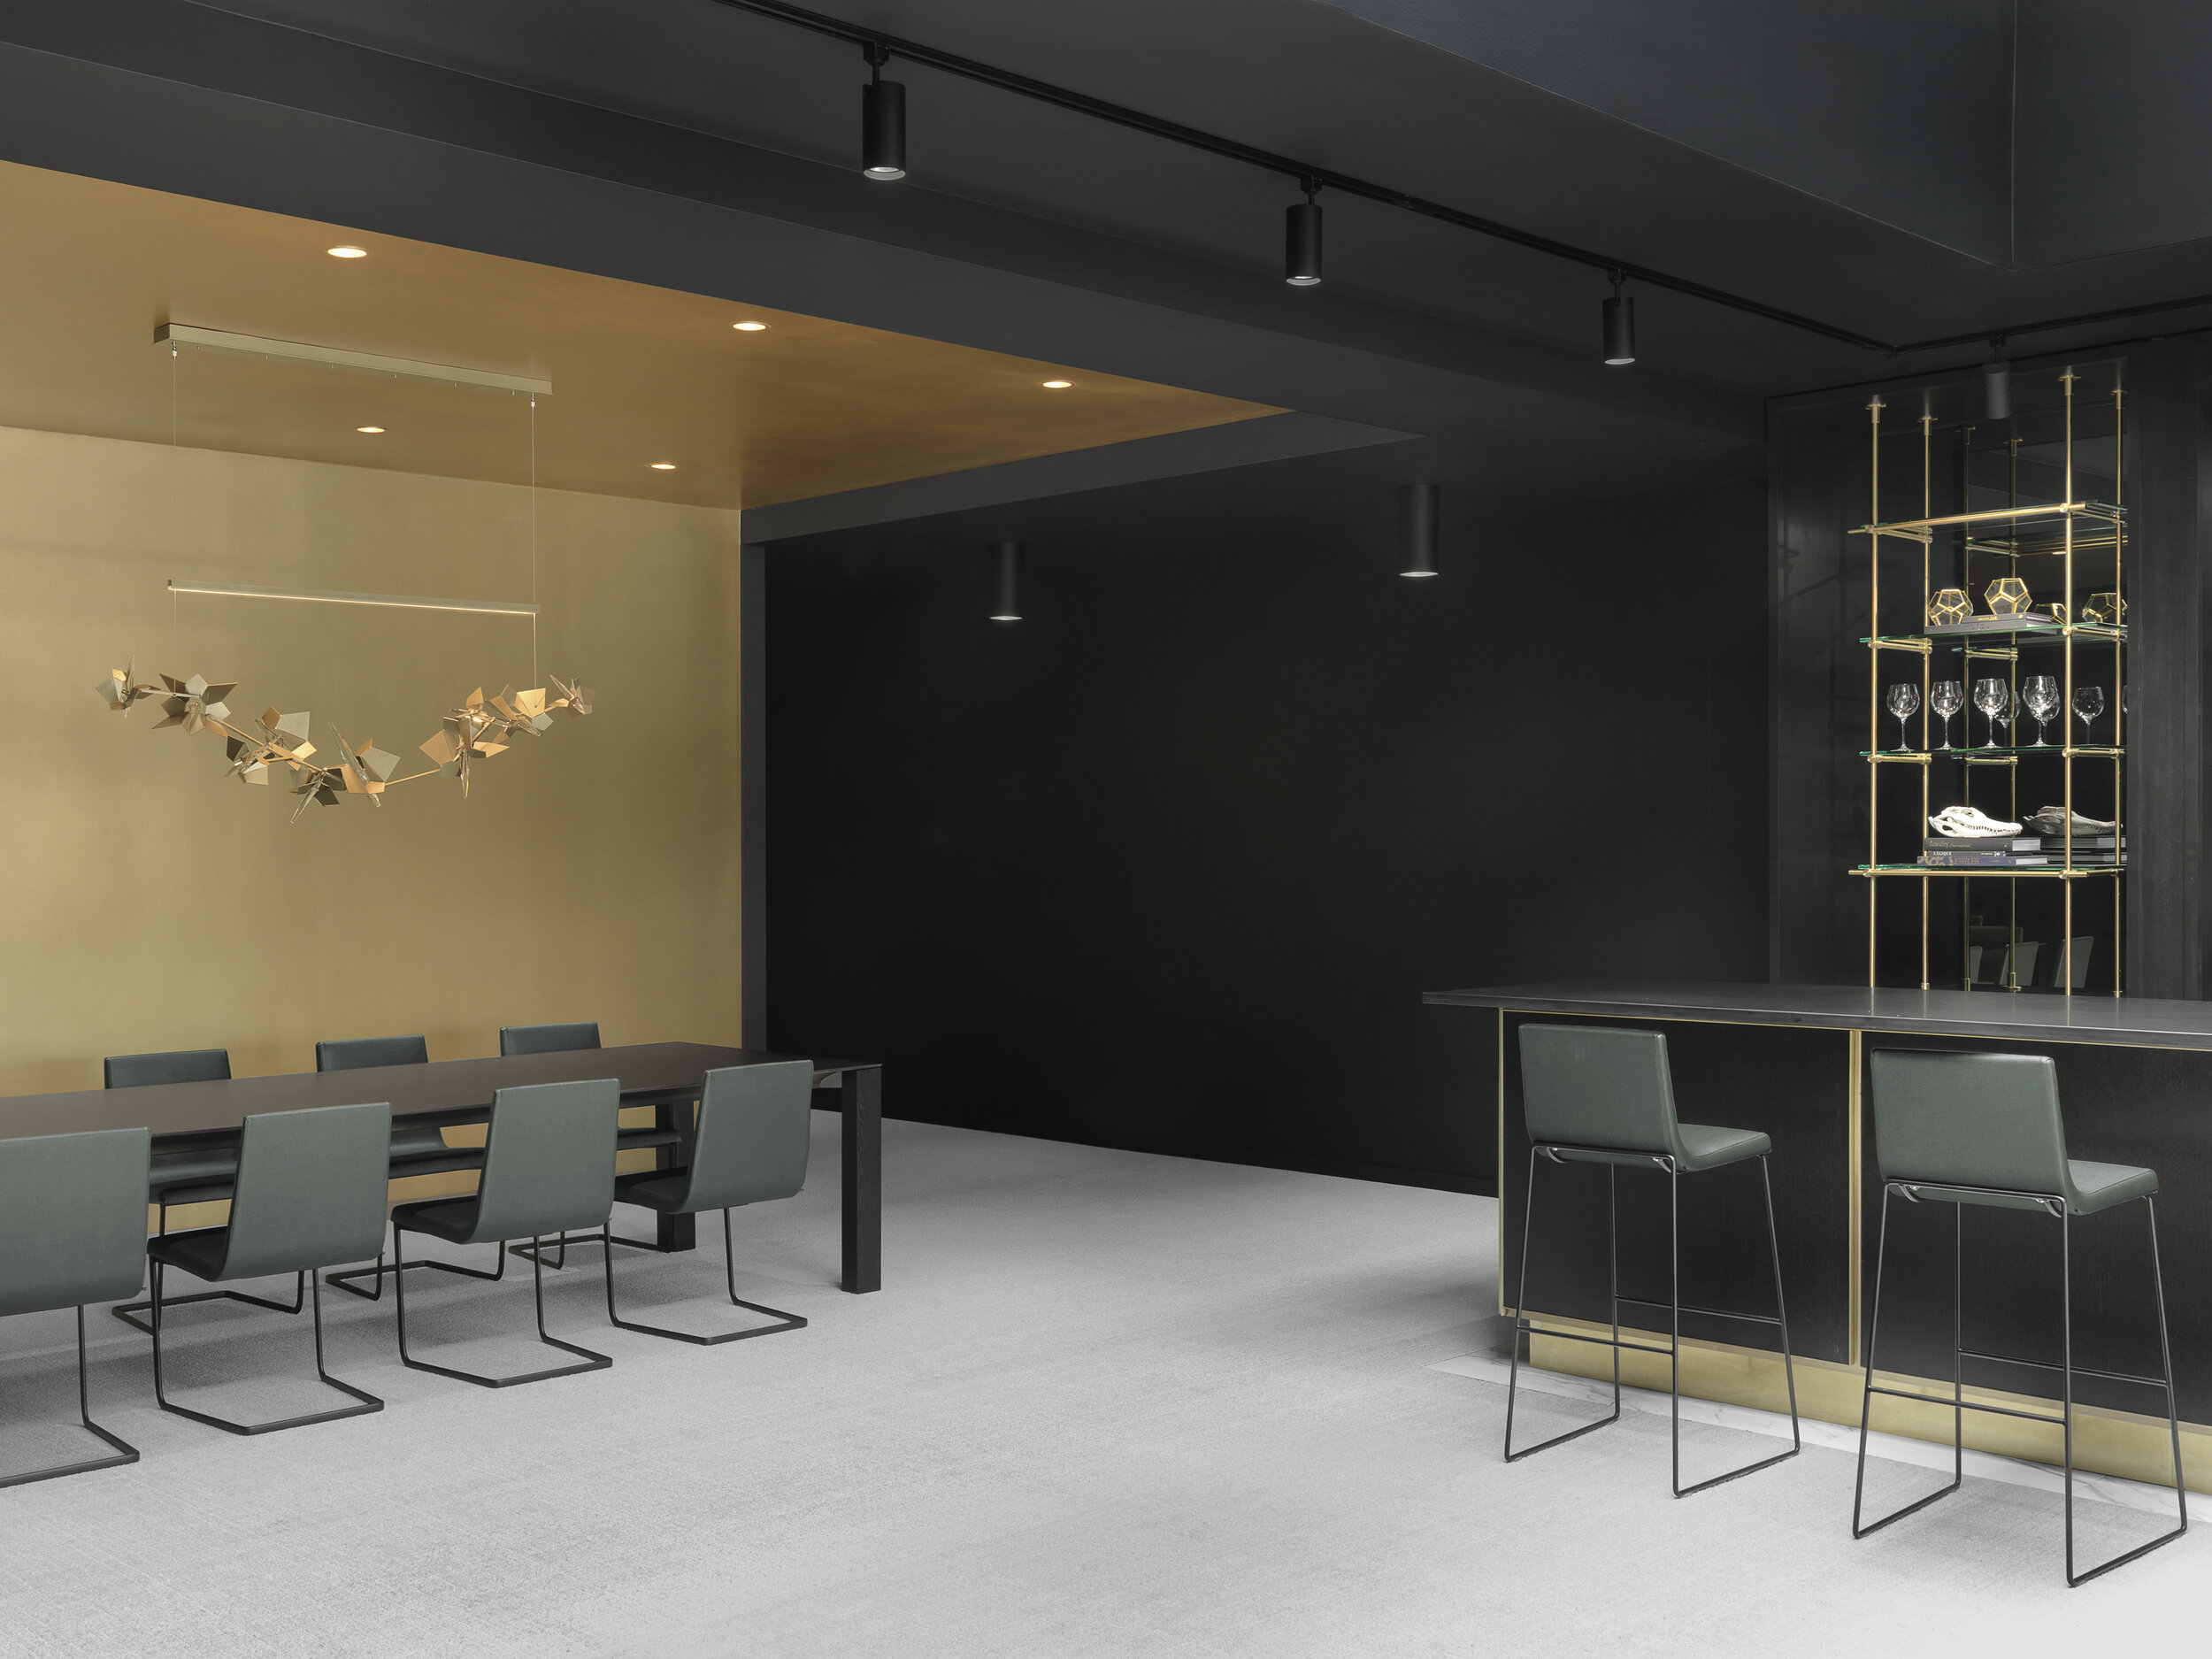 View of Dining Area in Showroom.jpg